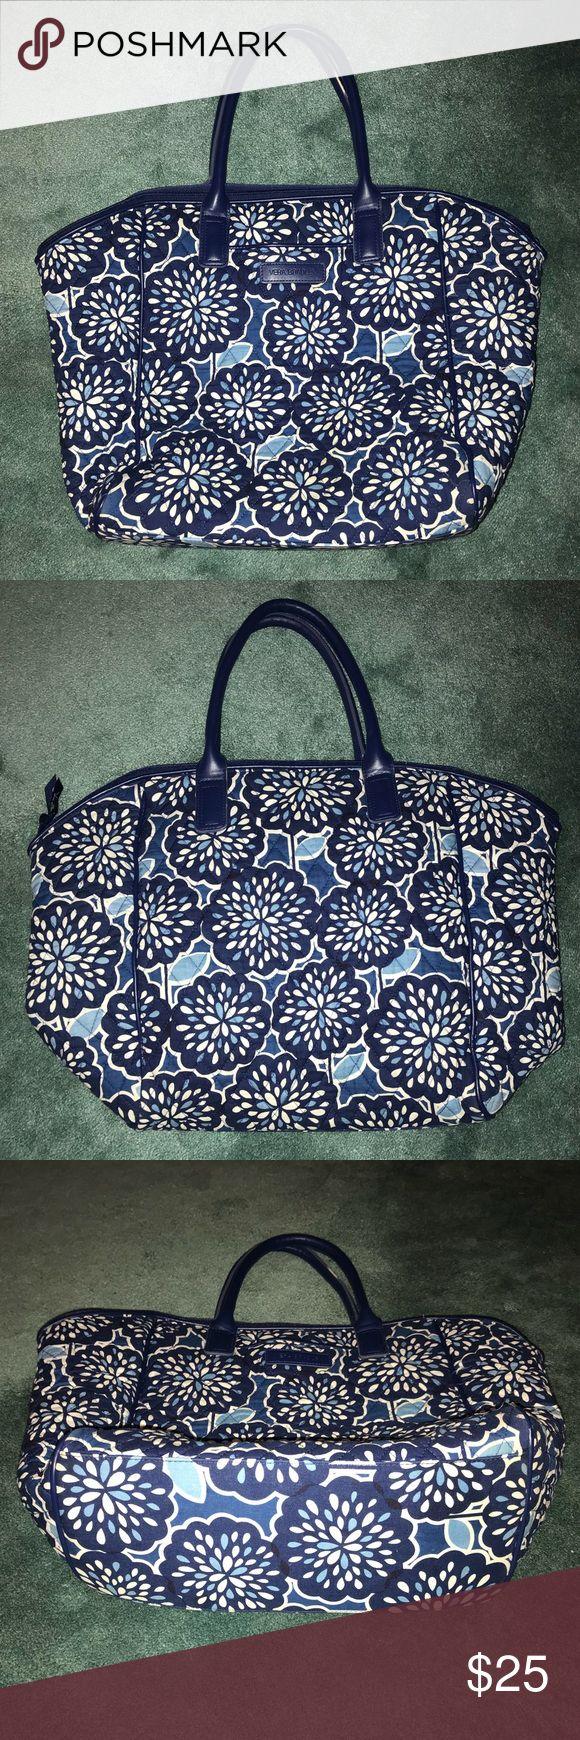 Vera Bradley Tote Bag Vera Bradley • Tote w/2 interior pouches & 1 zipper pocket • Great condition! • Reposhing to a new home 😊 Vera Bradley Bags Totes